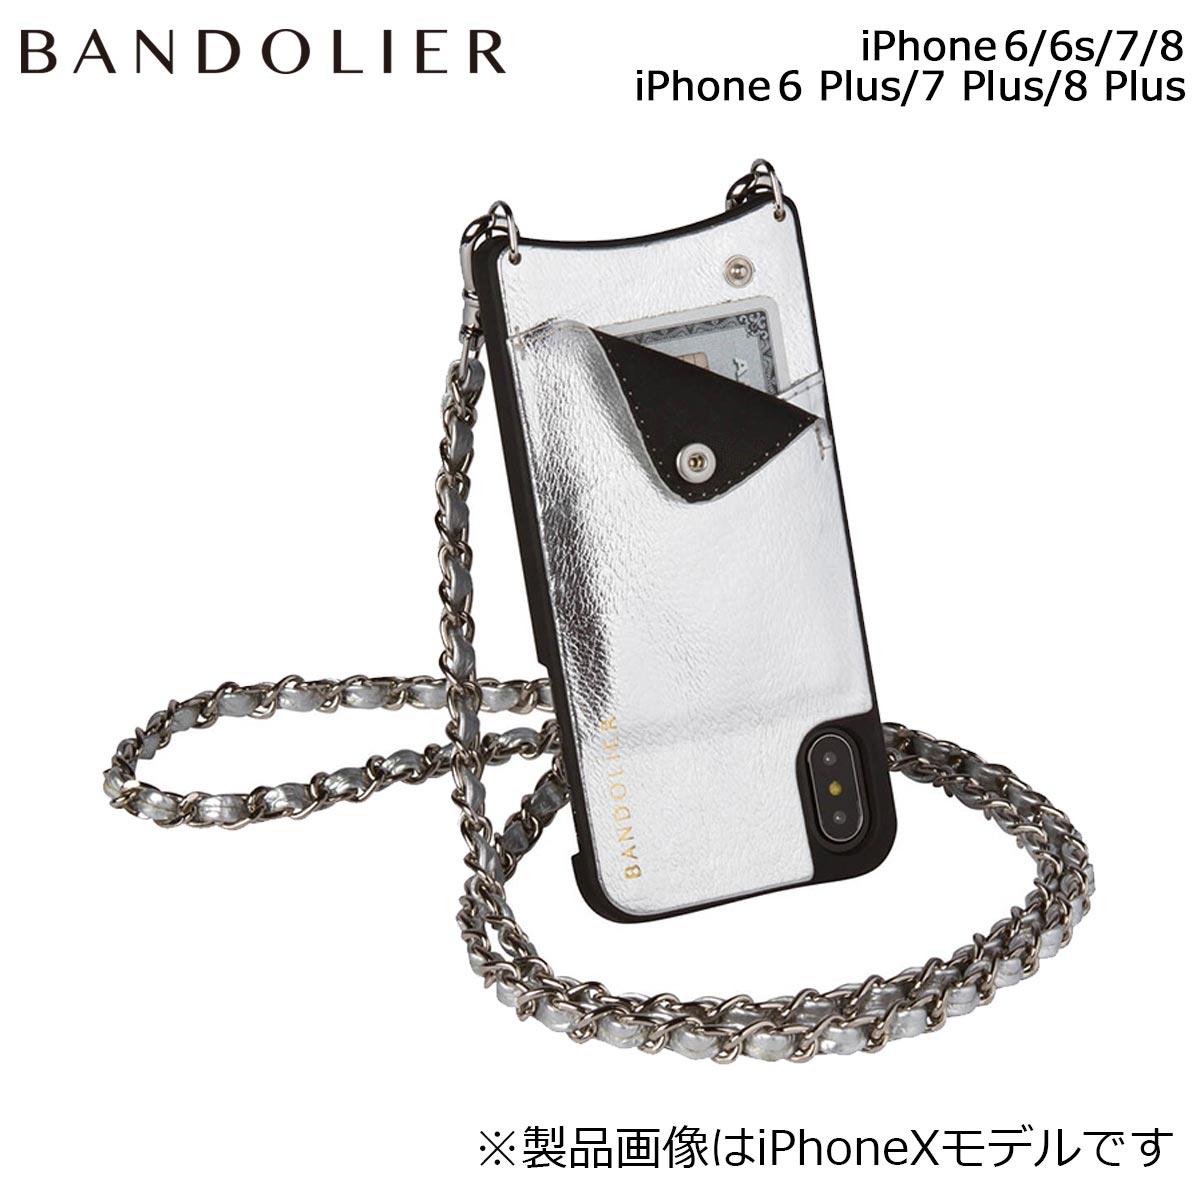 BANDOLIER LUCY METALLIC SILVER バンドリヤー iPhone8 iPhone7 7Plus 6s ケース スマホ アイフォン プラス メンズ レディース シルバー [9/14 追加入荷]